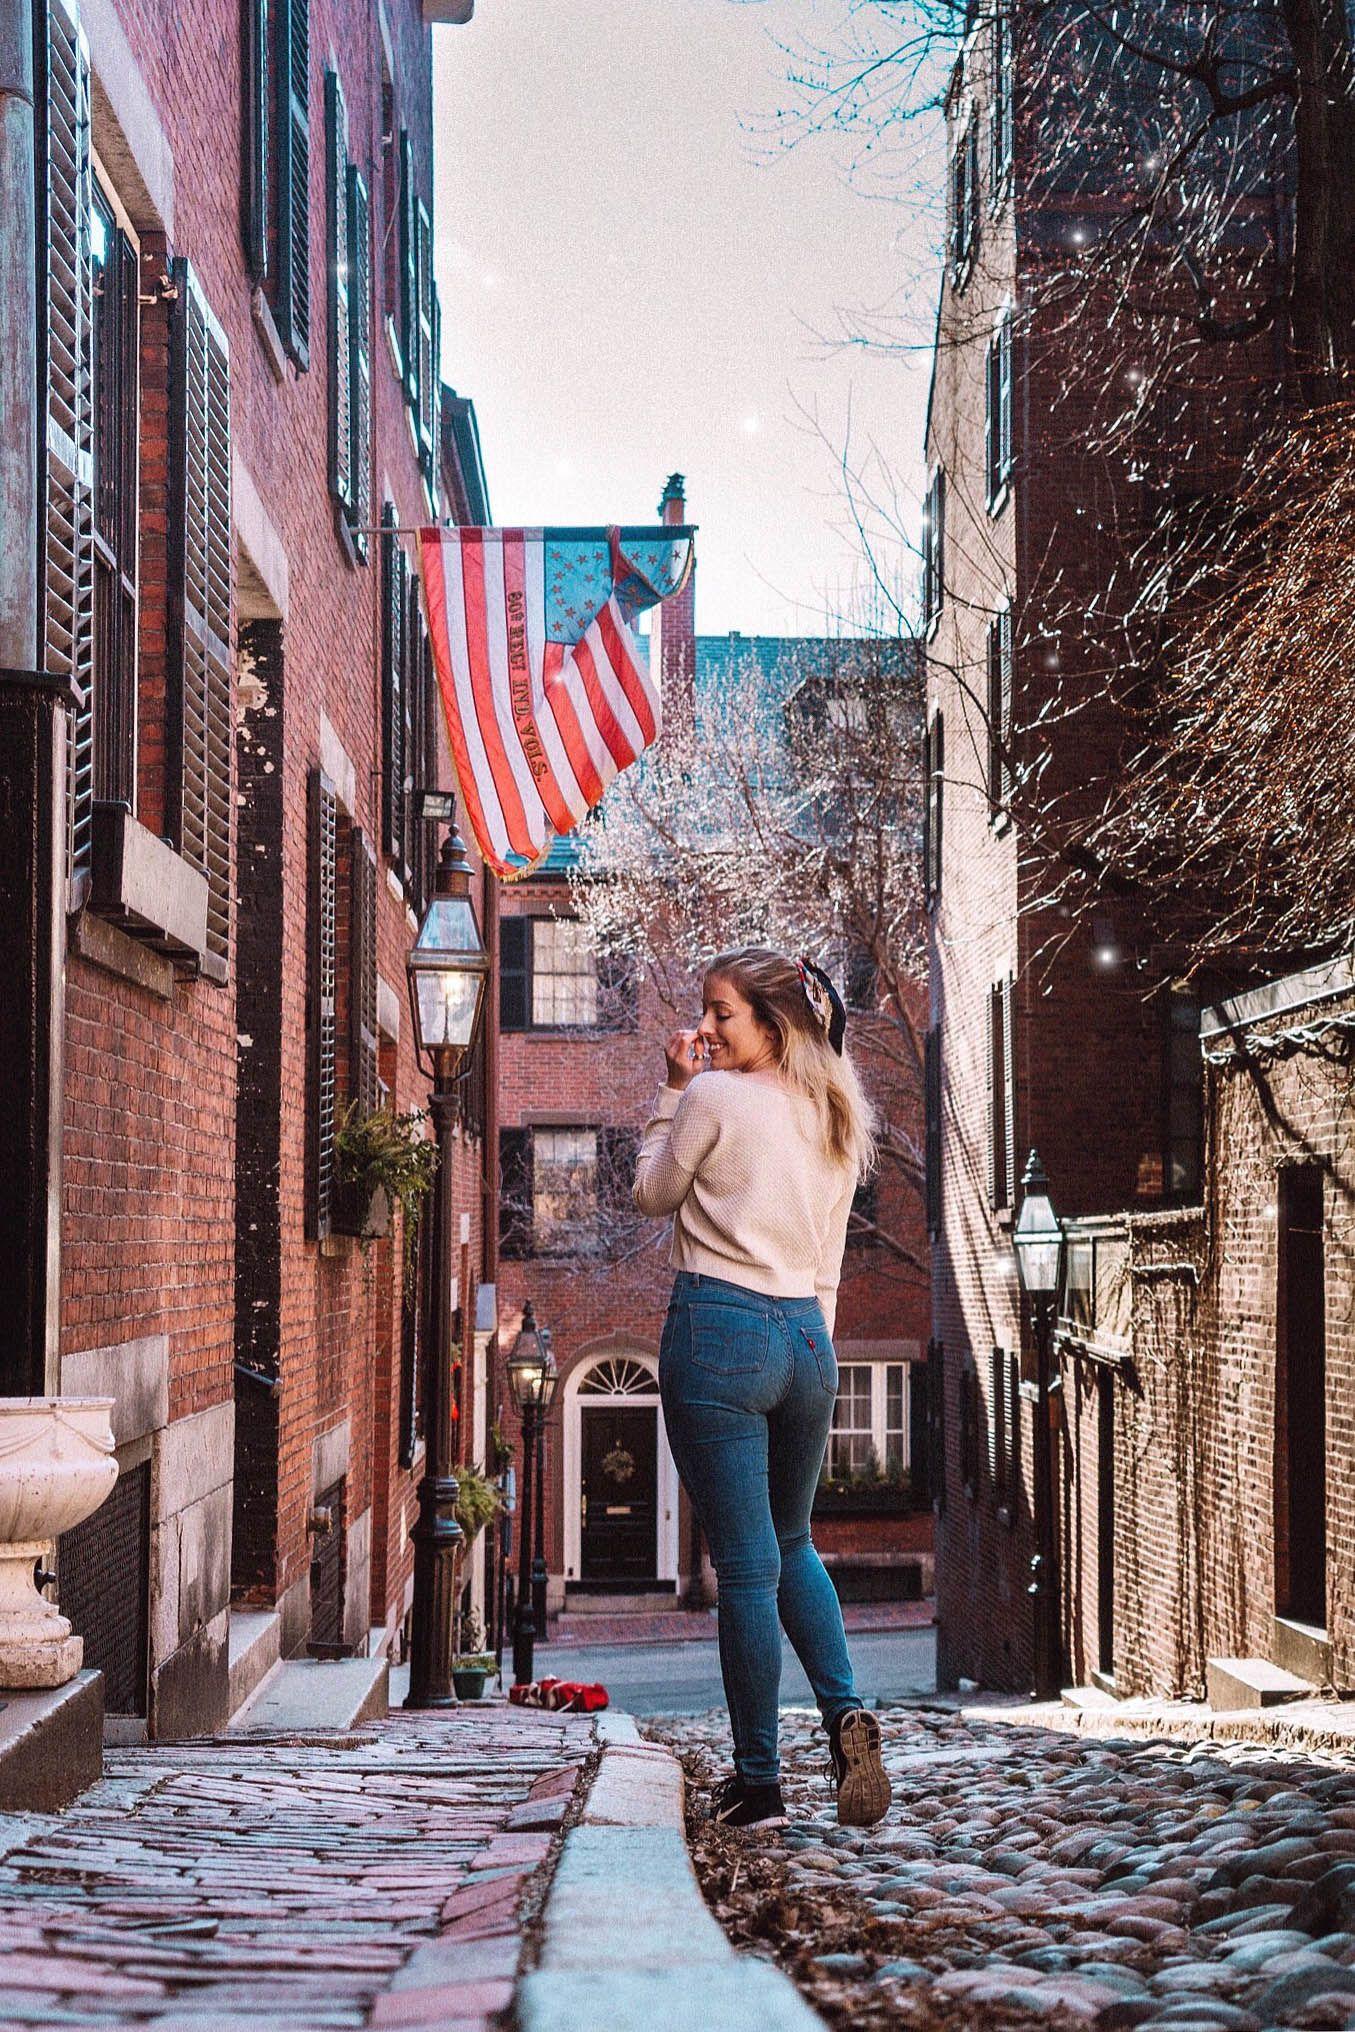 How to Spend 48 Hours in Boston In boston, Boston public